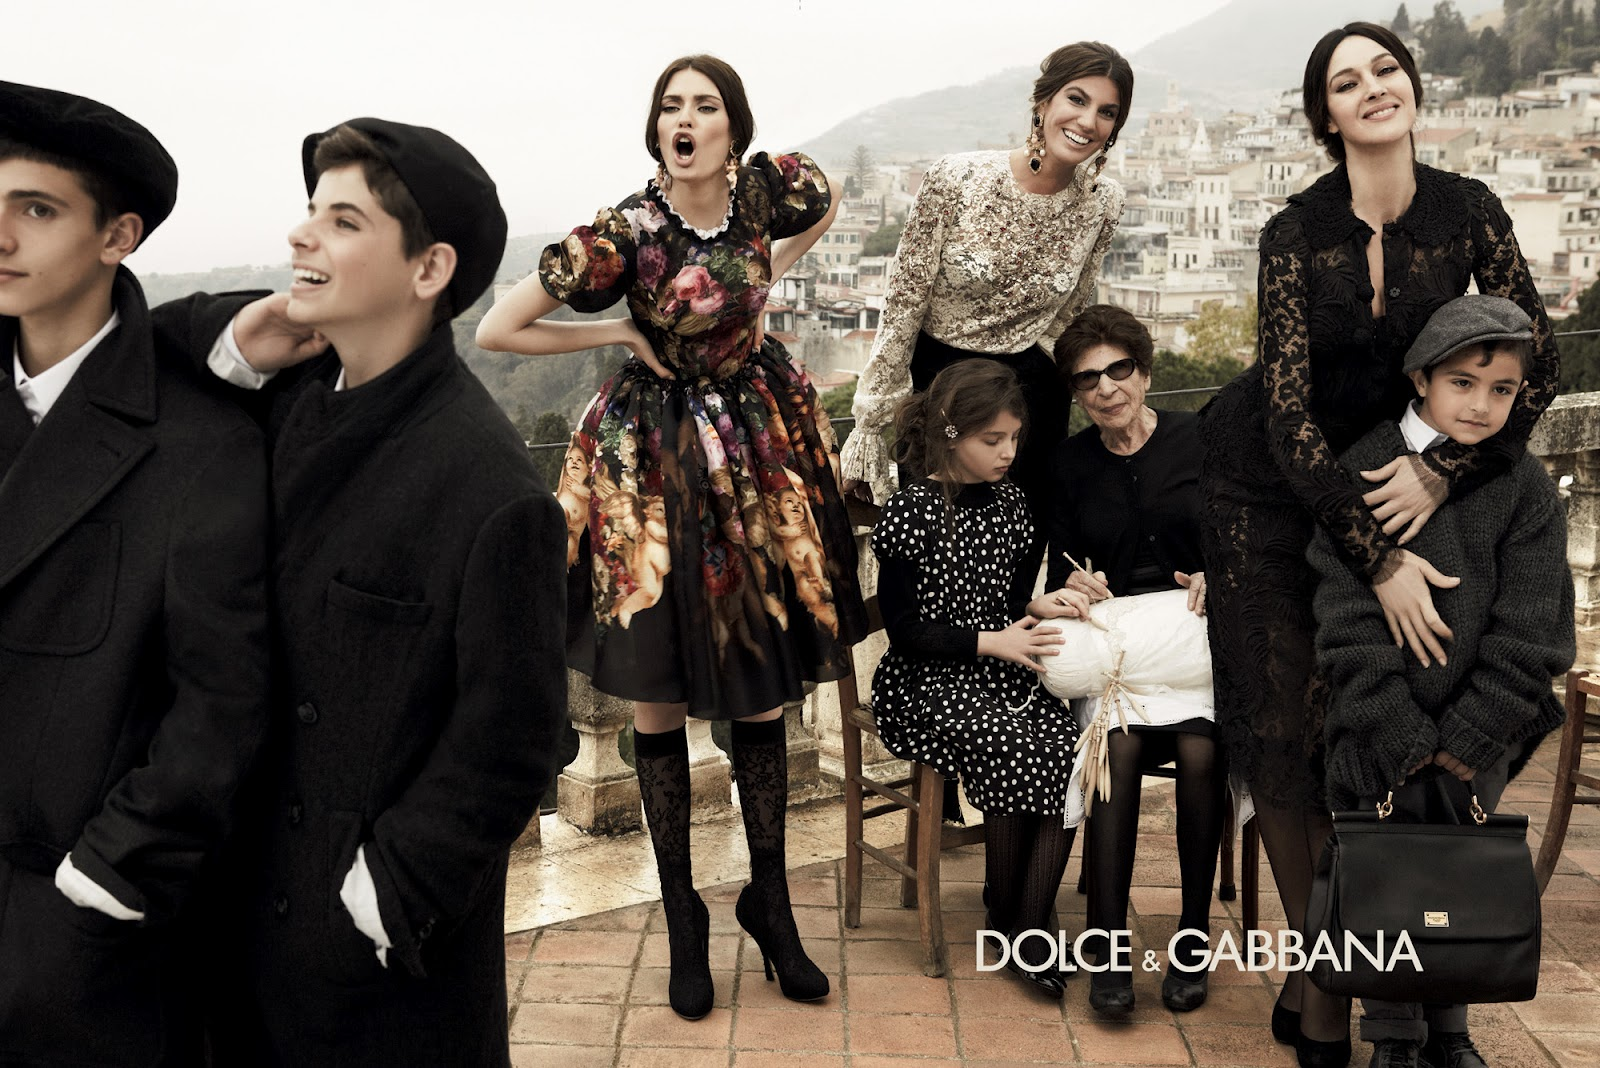 Dolce & Gabbana F/W 2013 Campaign